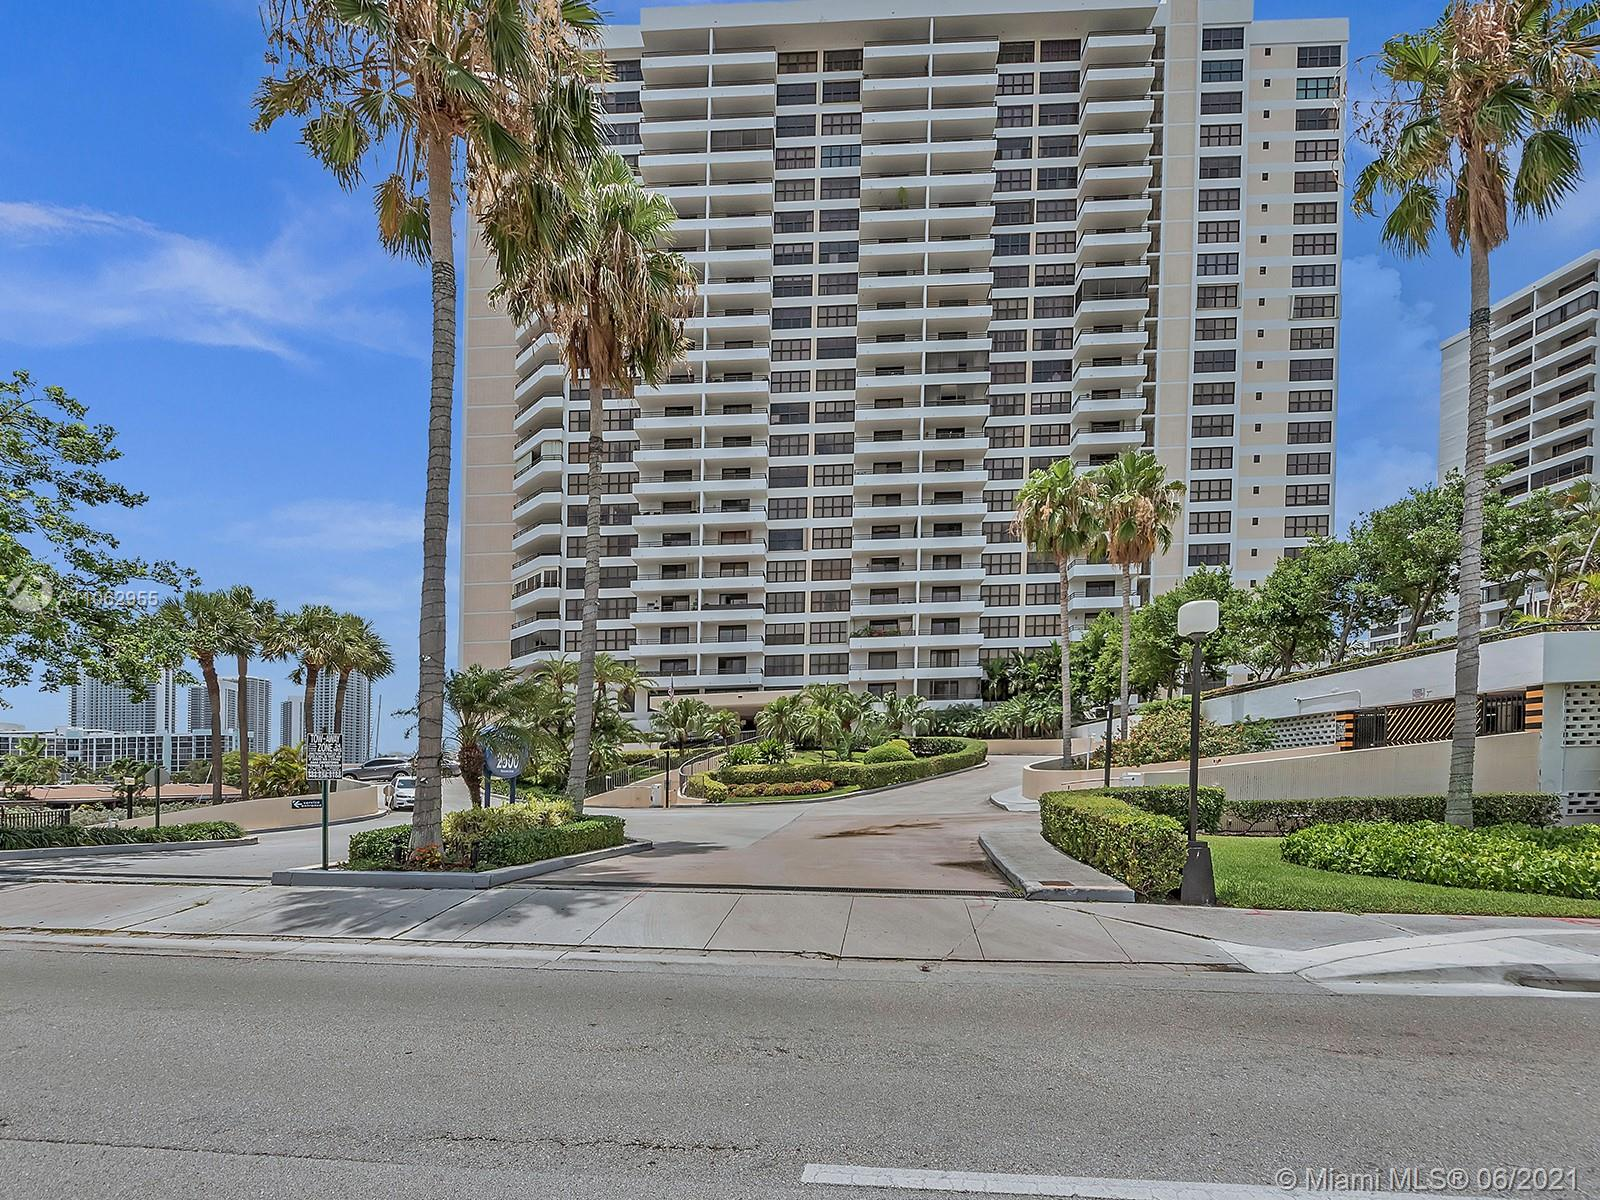 Olympus C #2112 - 2500 Parkview Dr #2112, Hallandale Beach, FL 33009